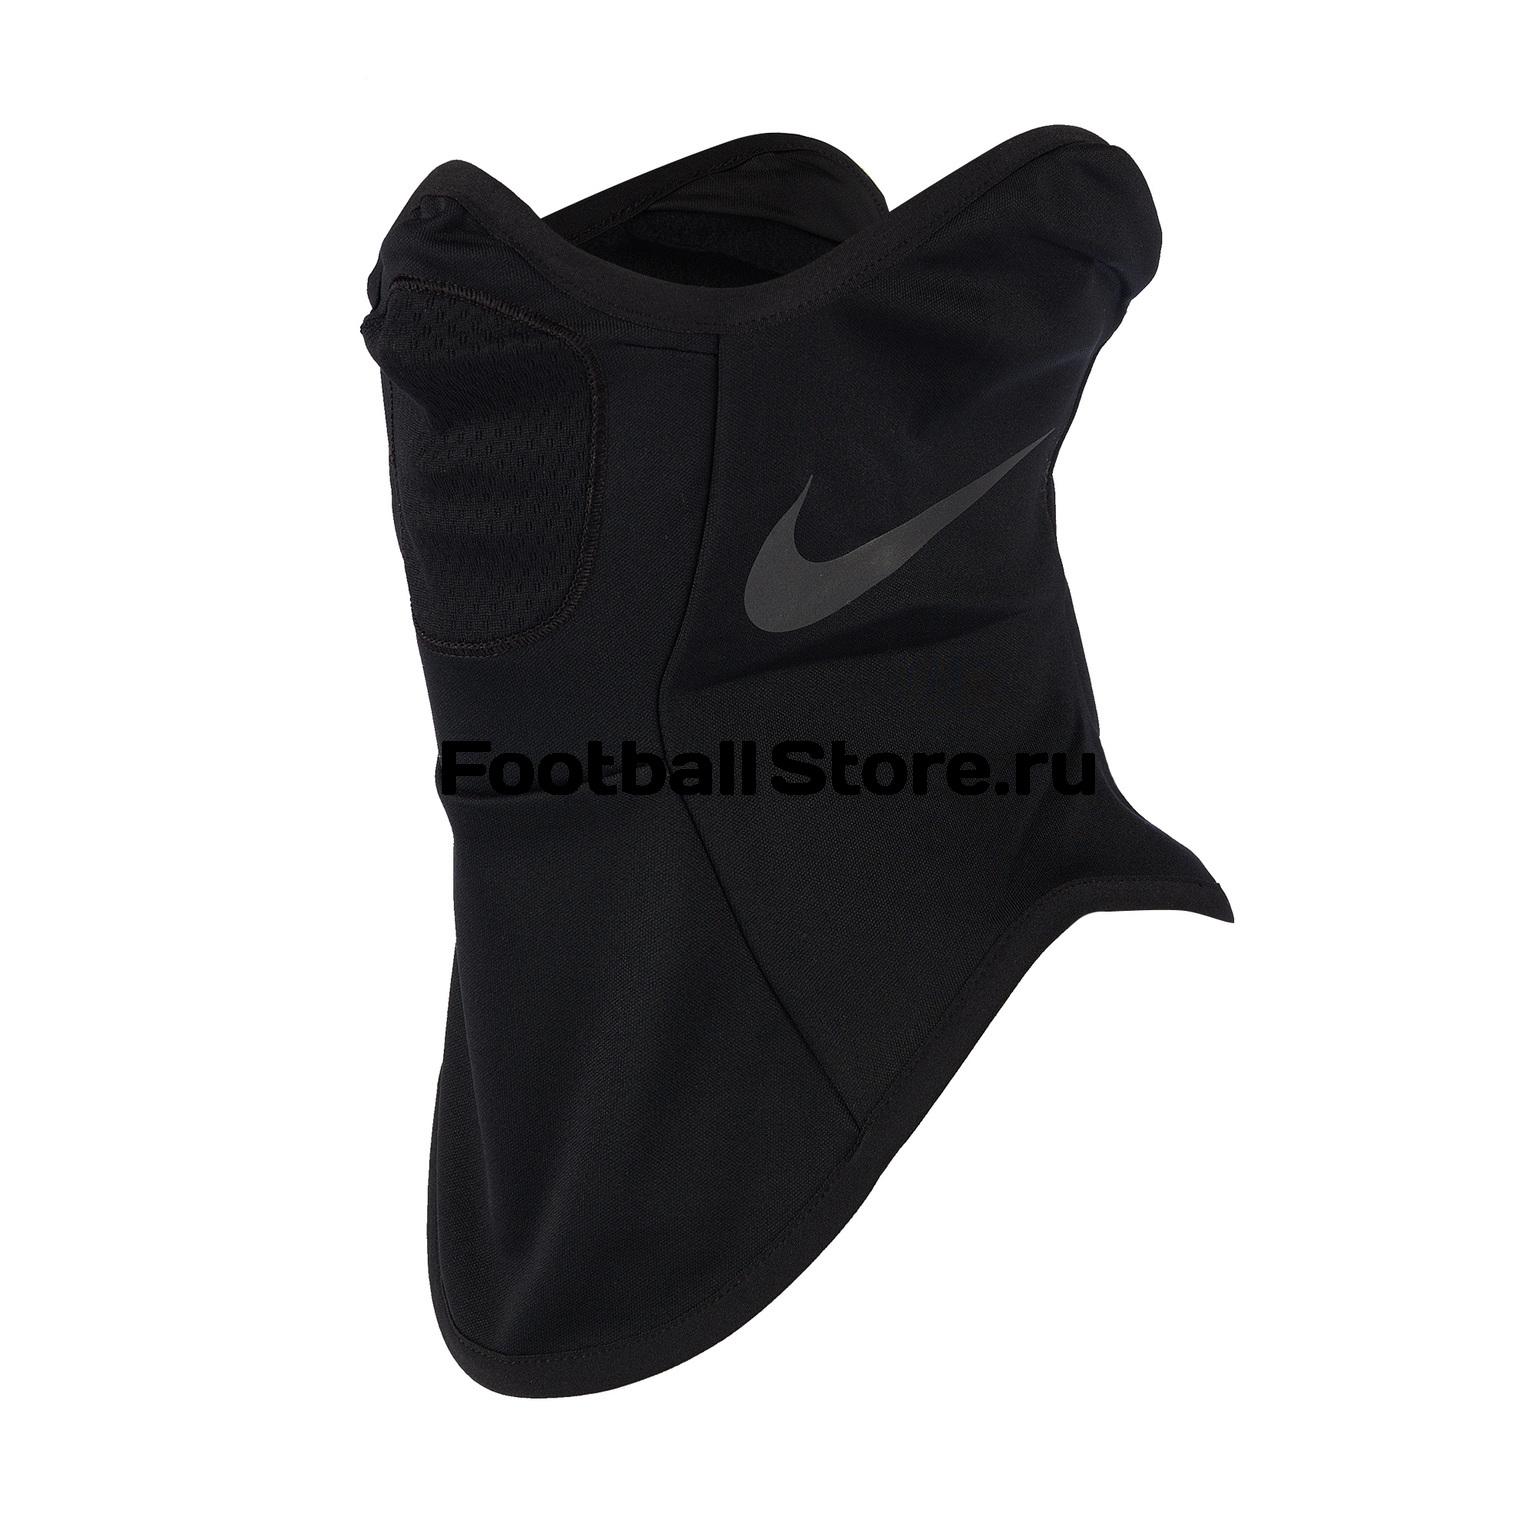 Повязка на шею Nike SQD Snood AQ8233-013 повязка на шею гейтор nike basic warmer n wa 55 010 os